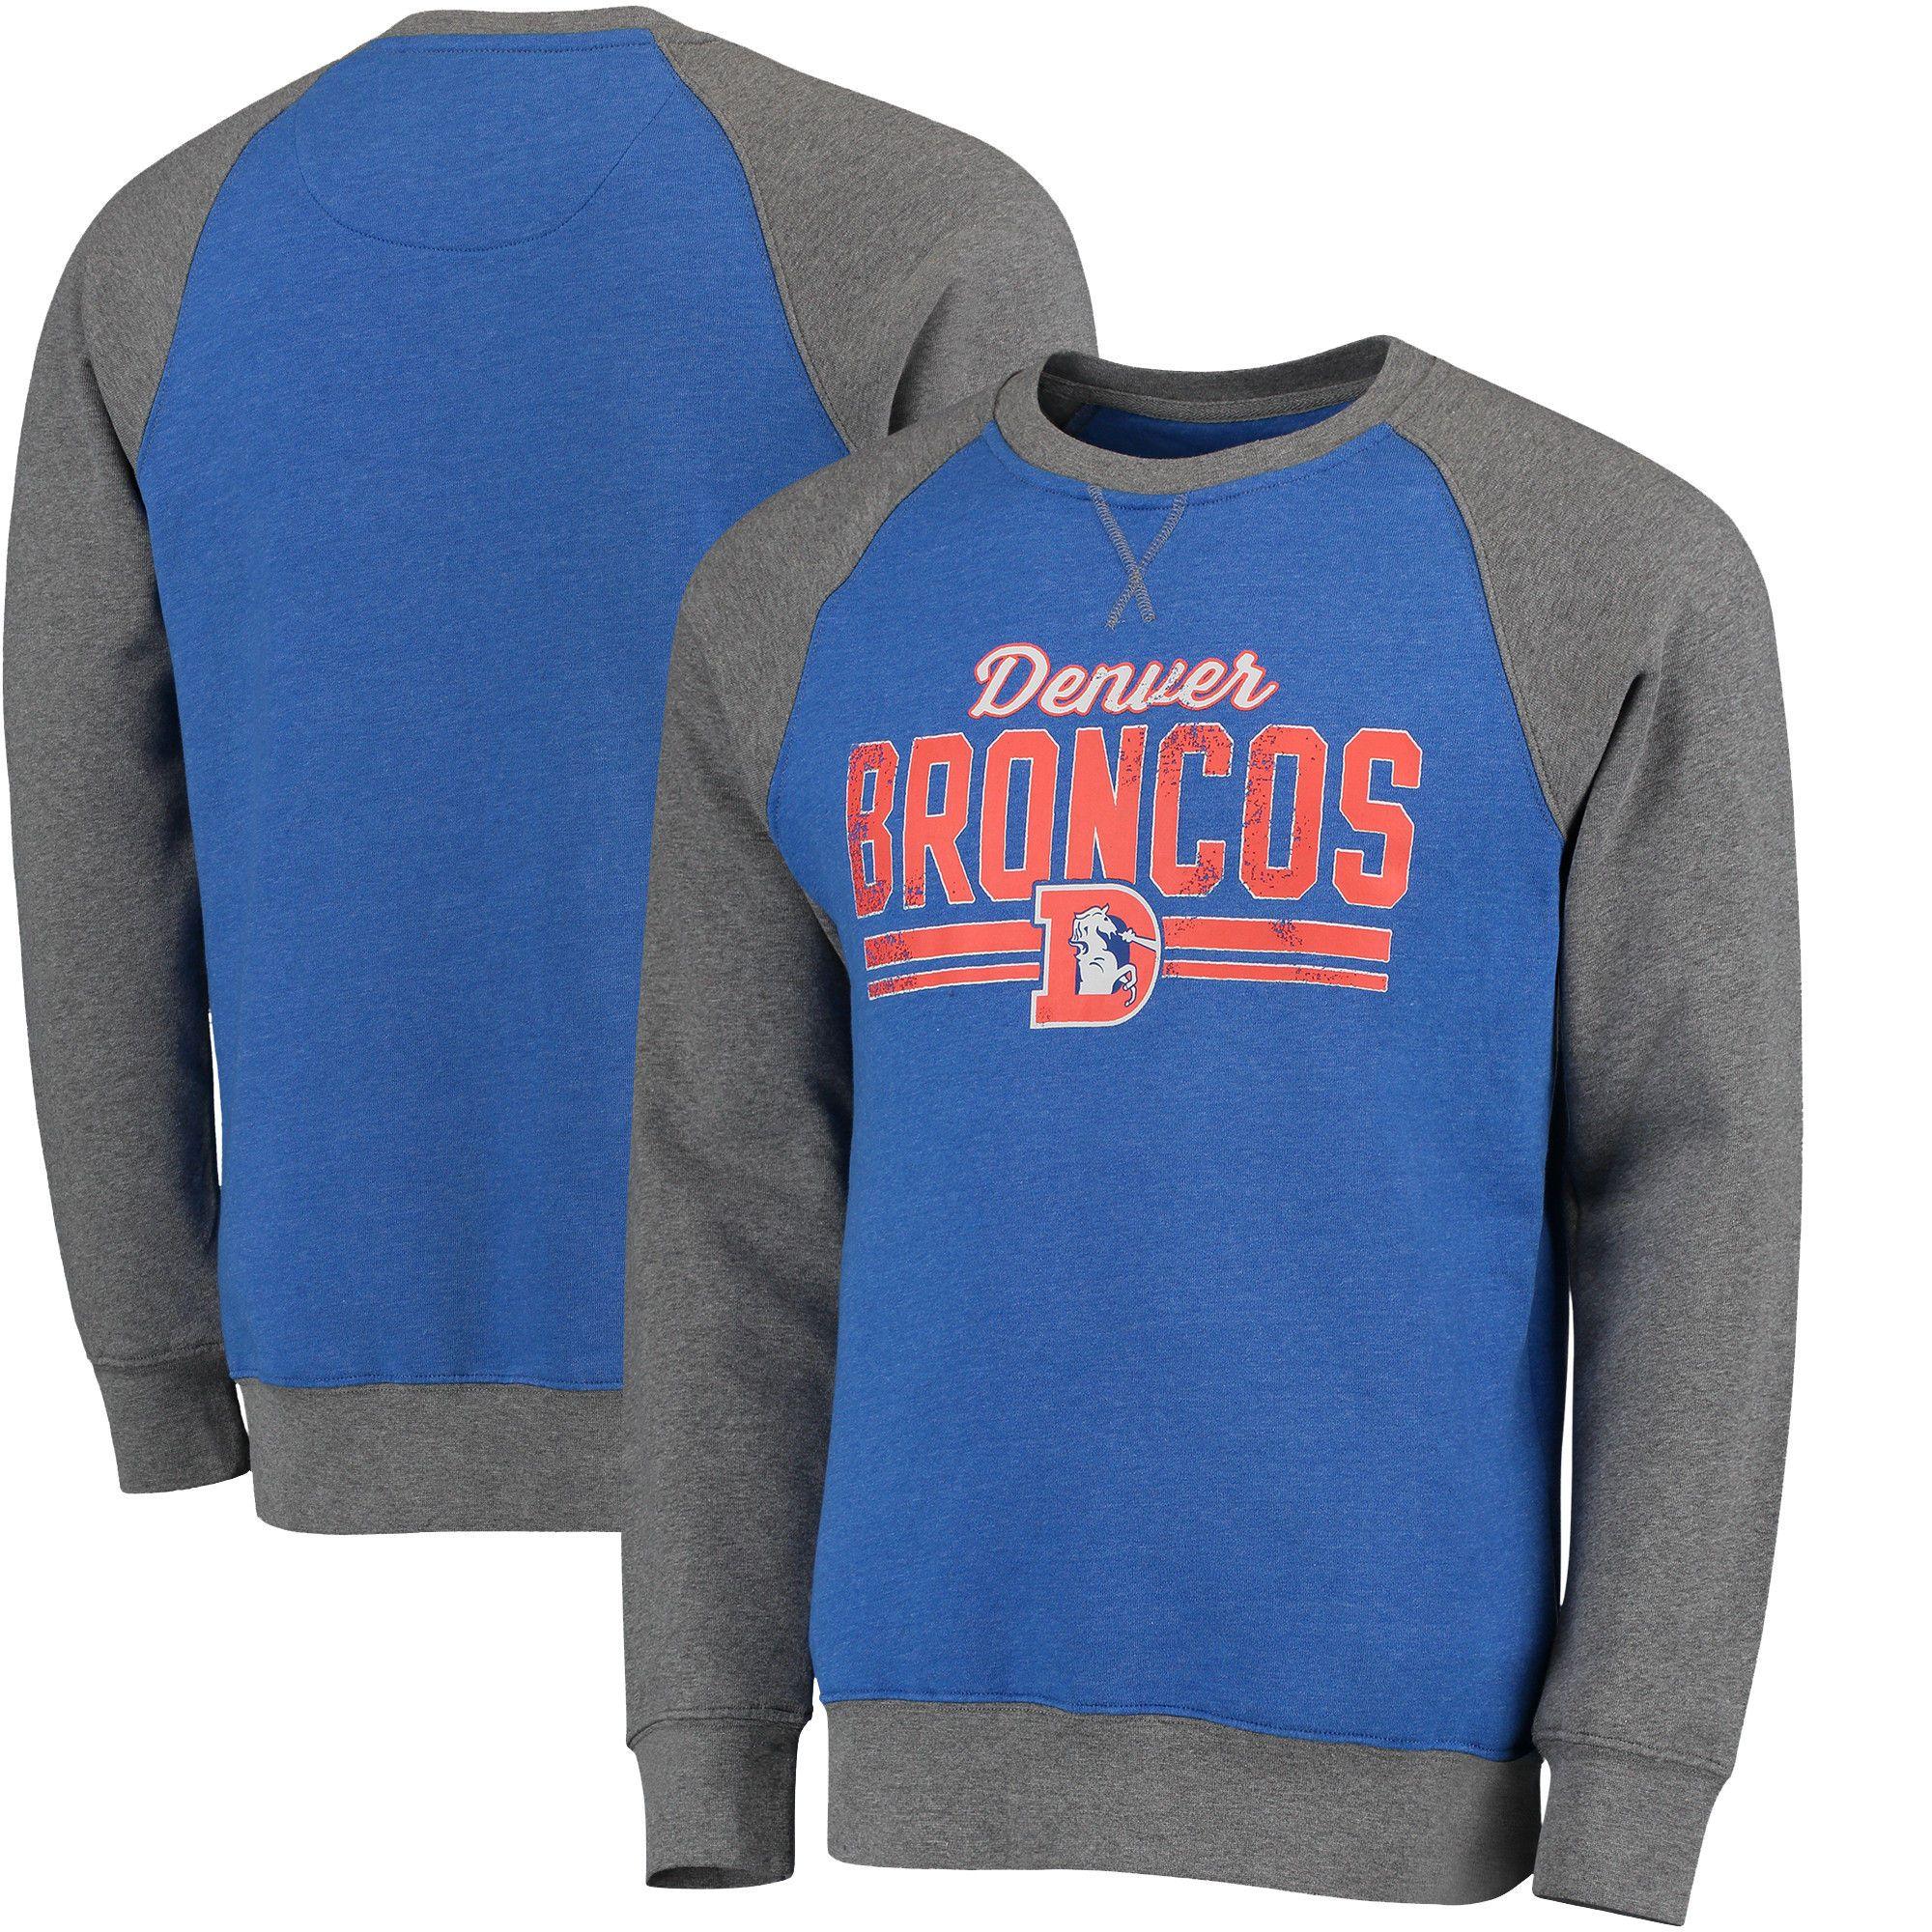 c0c6e81dd Men s Denver Broncos Pro Line Royal Timeless Booster Varsity Crew Fleece  Raglan Sleeve Tri-Blend Sweatshirt